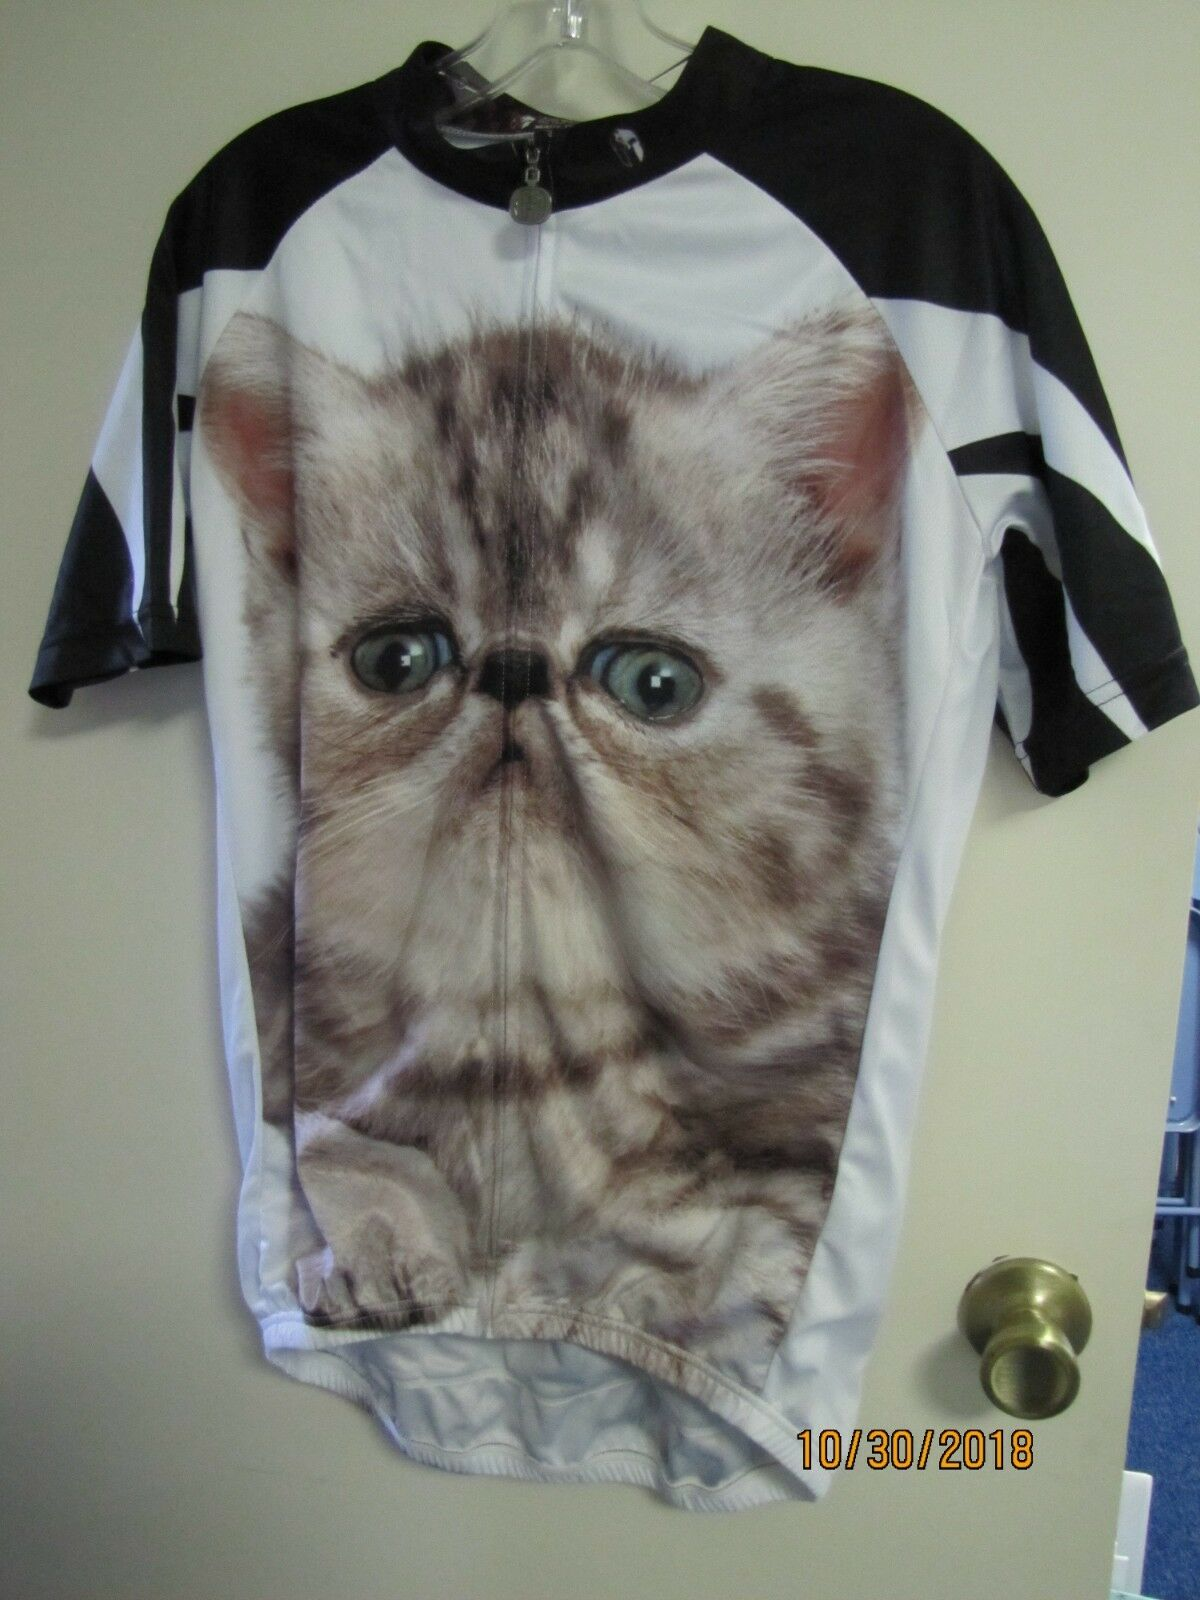 EUC Paladin Men's White Cat Kitty Cycling Jersey Short Sleeve Bike Shirt Poly L